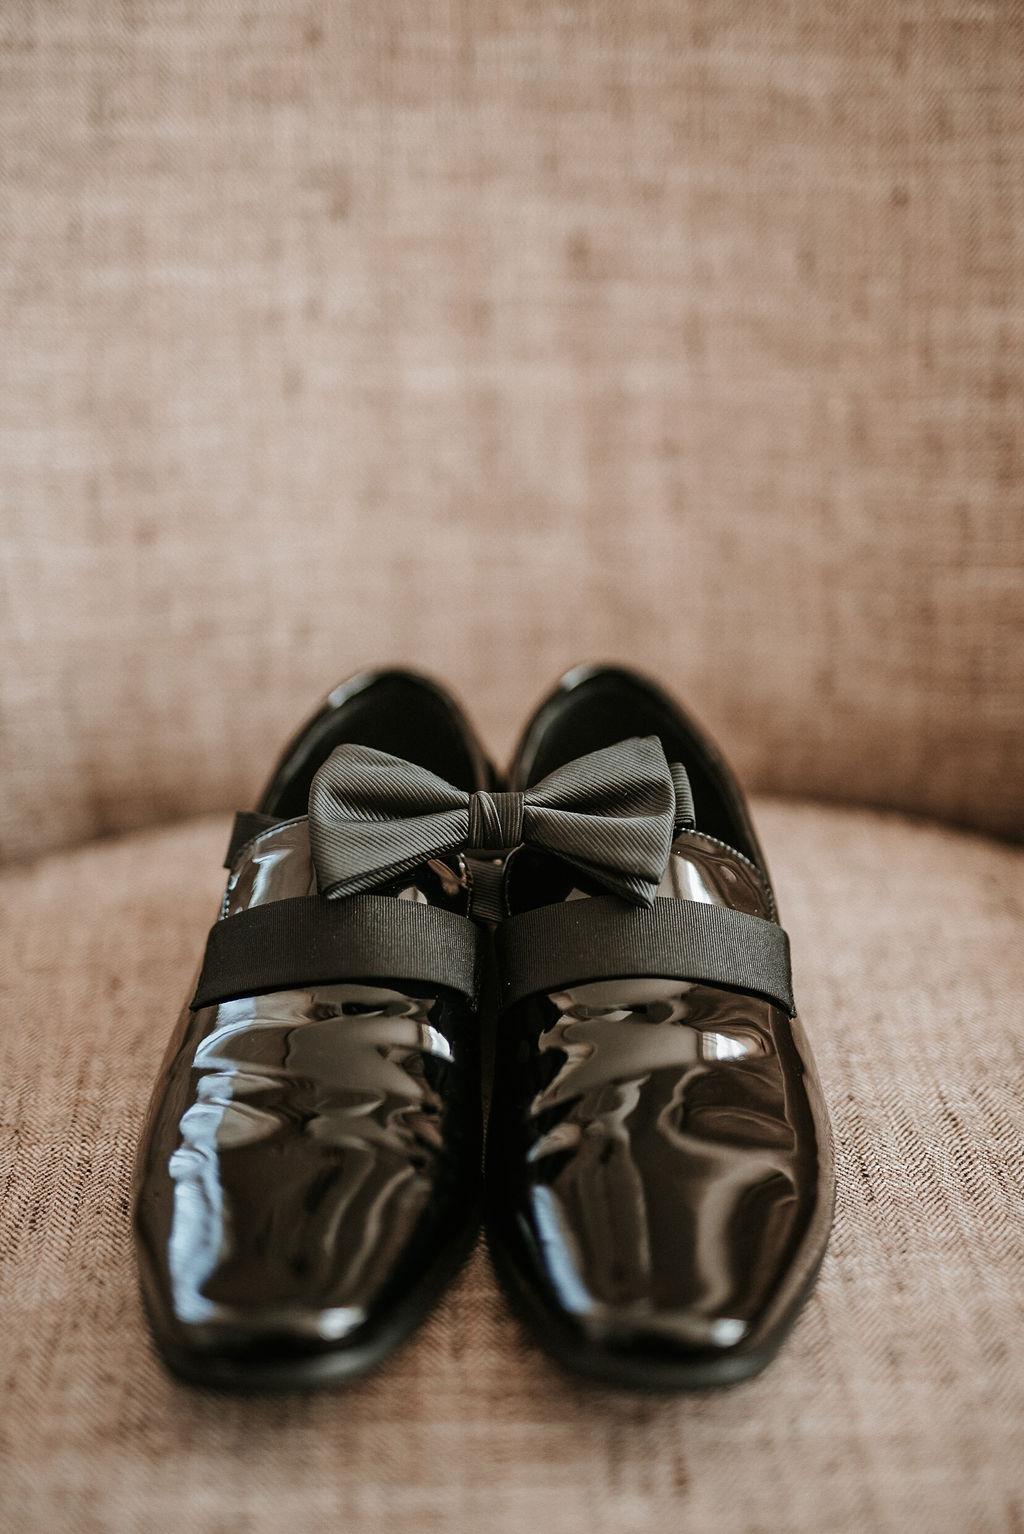 Detail shot of Groom's shoes at Bluemont Vineyard